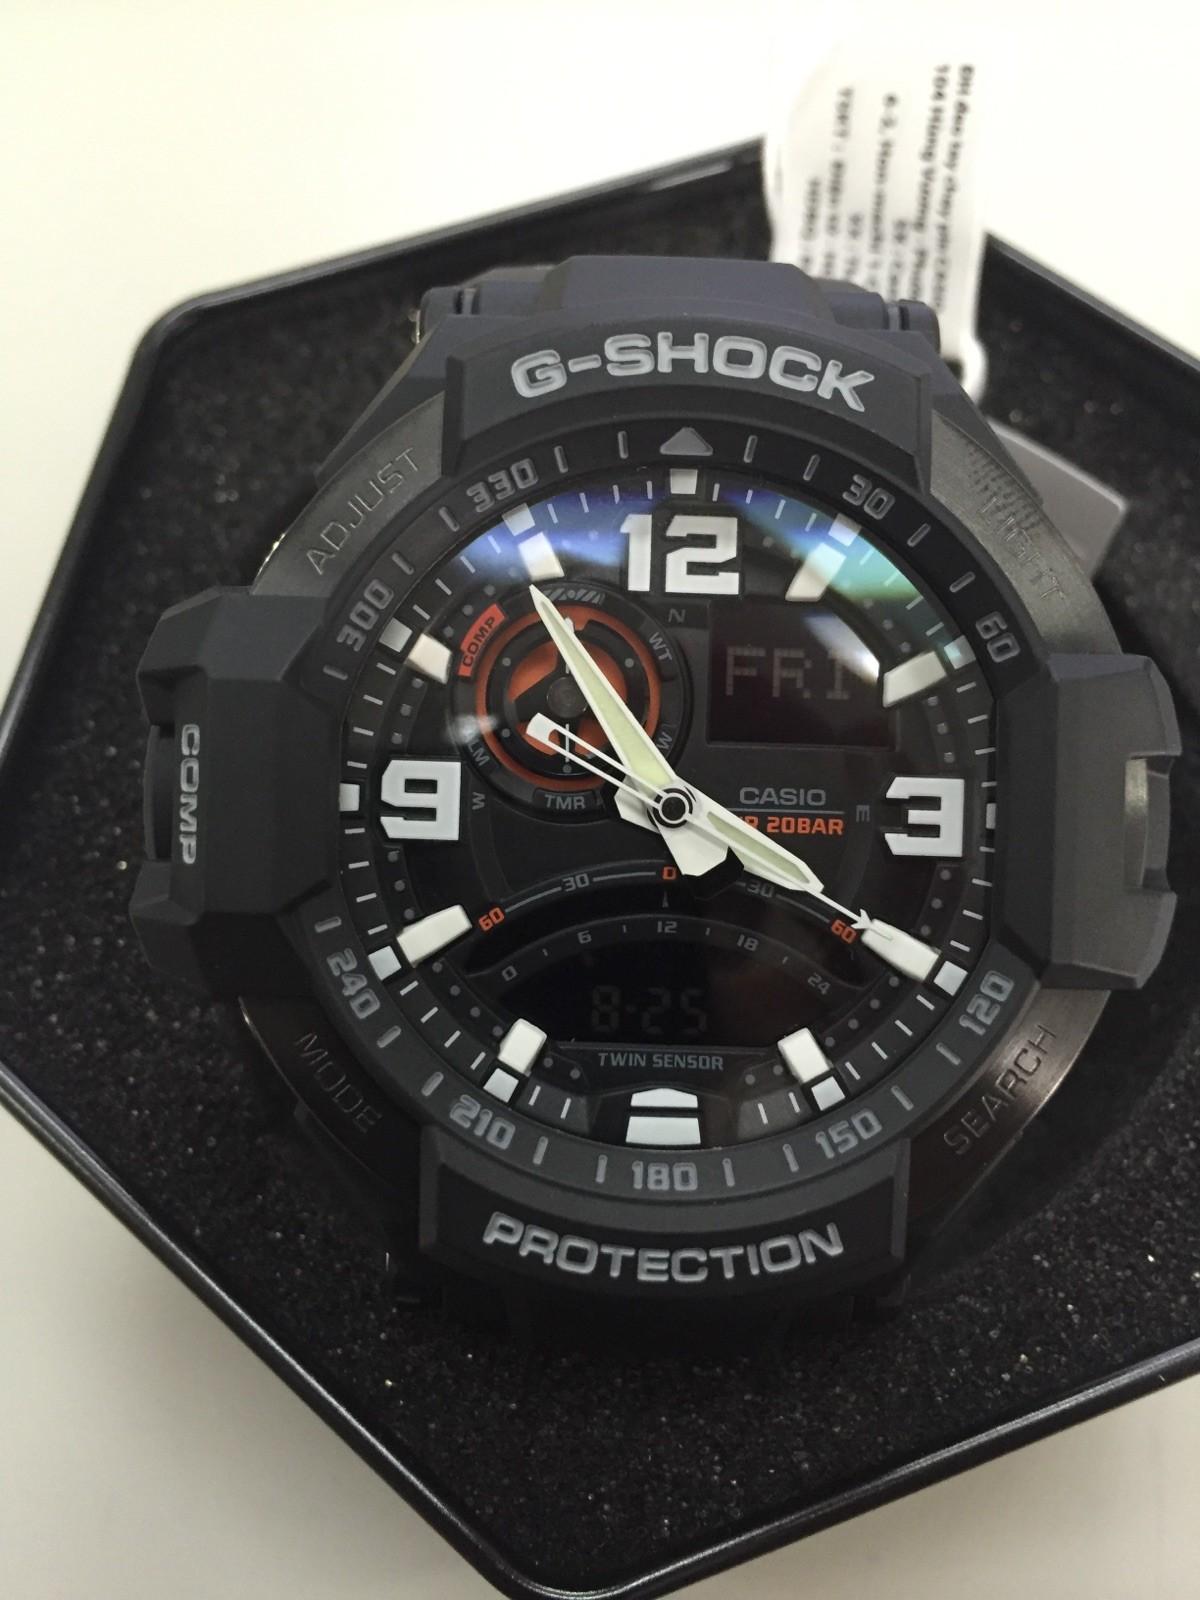 Nuevodesgastado Reloj Casio Gshock Gravity Master Ga 1000 1adr En G Shock Twin Sensor Nuevos Relojes